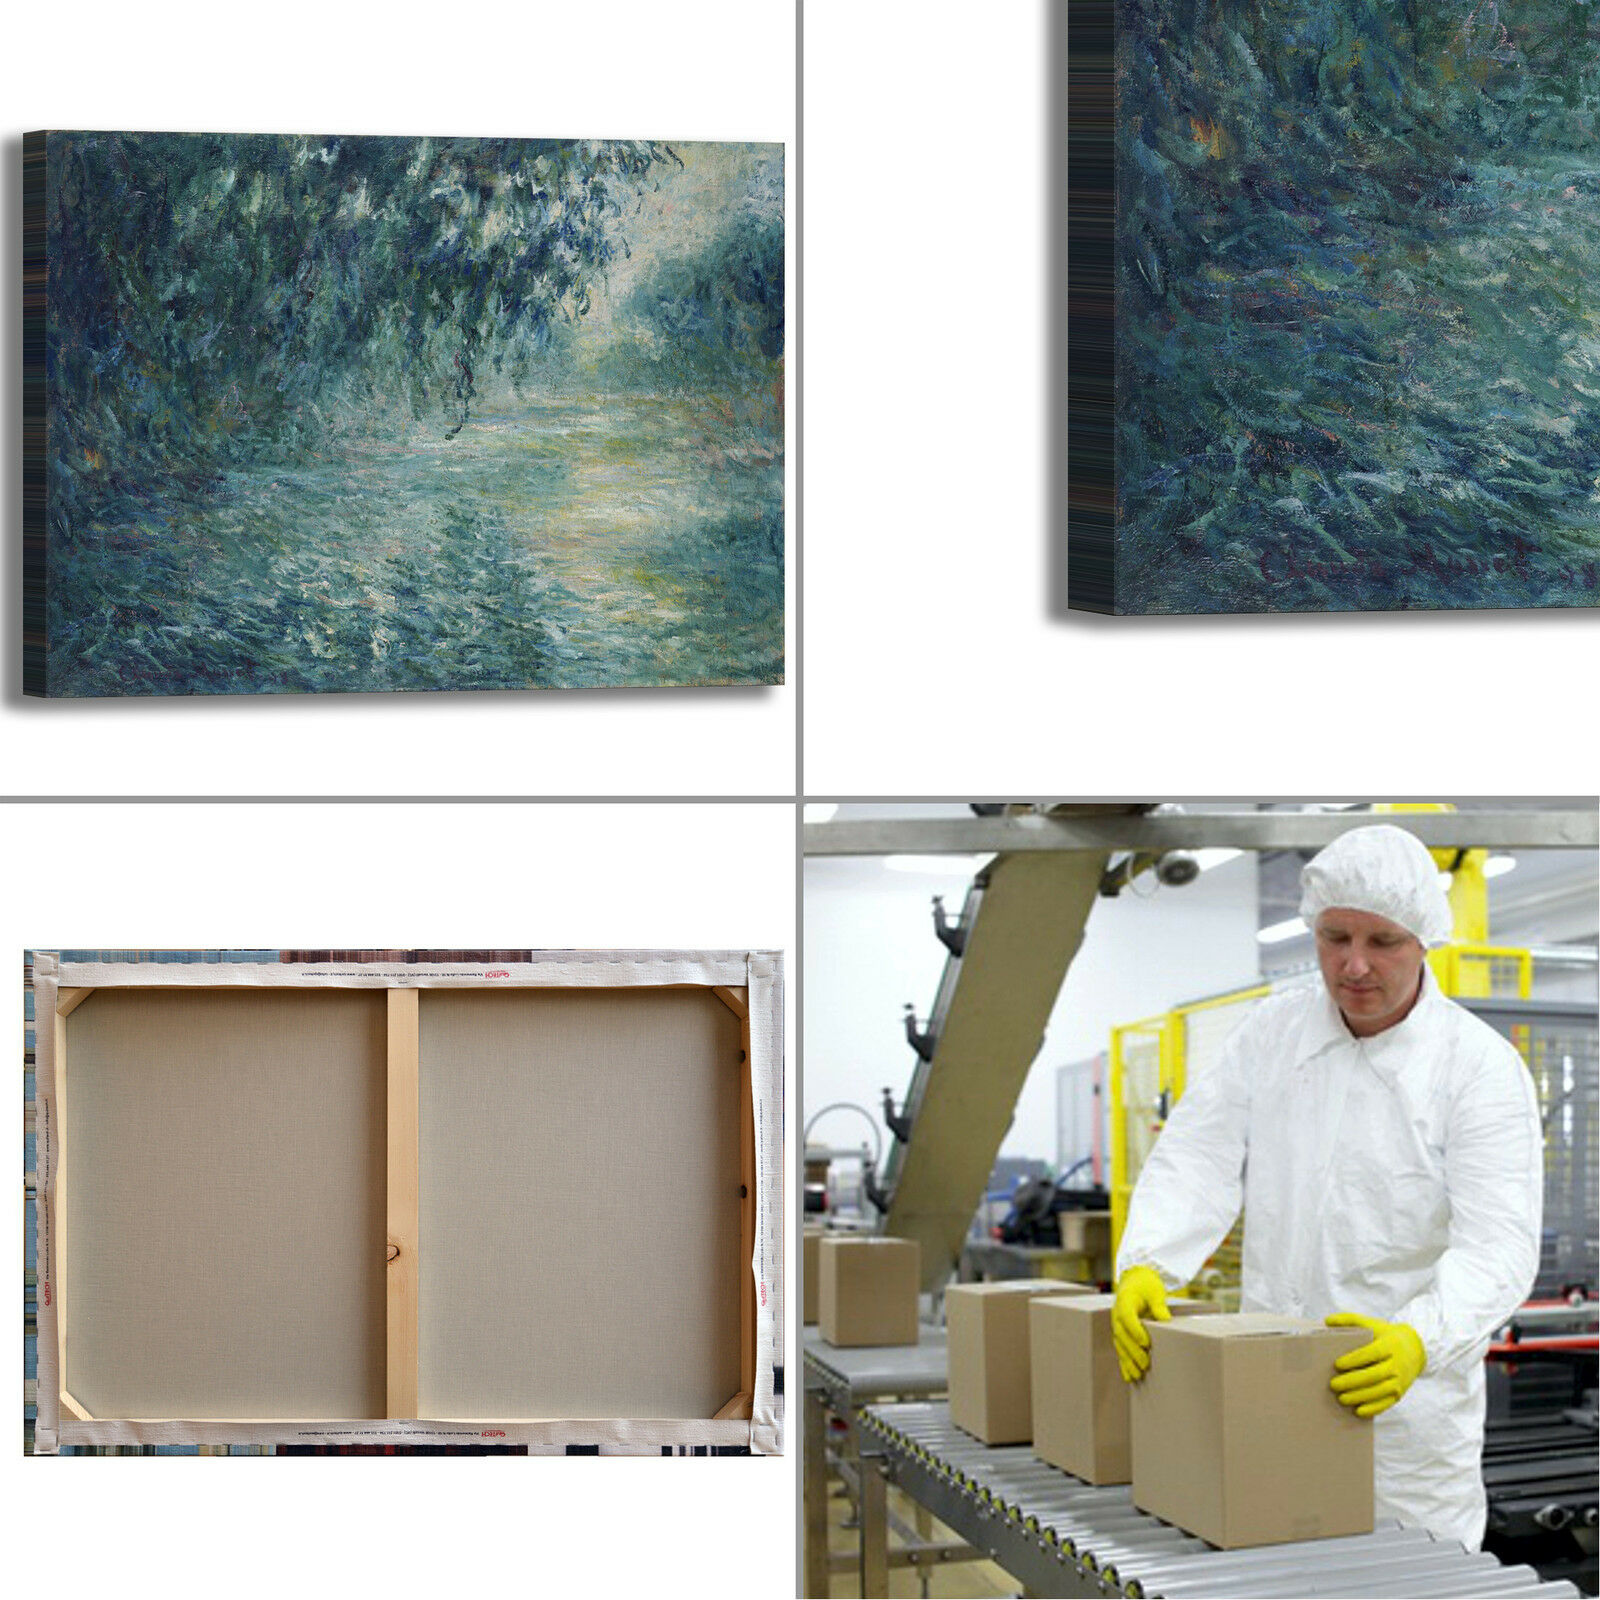 Monet mattina sulla Senna Senna Senna design quadro stampa tela dipinto telaio arrossoo casa 183251